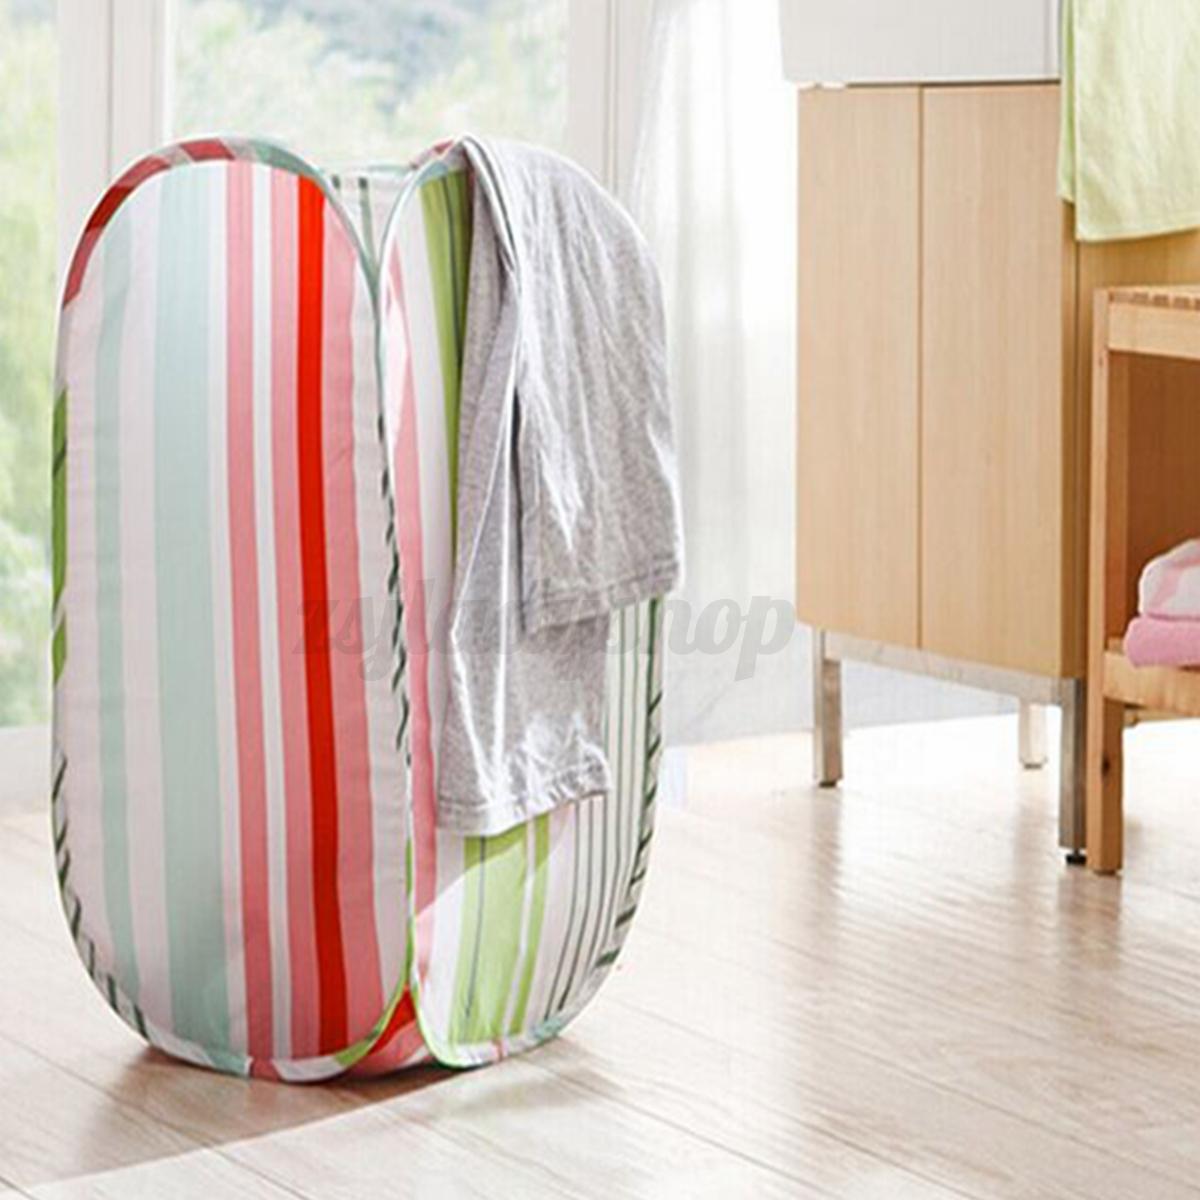 New Foldable Pop Up Washing Clothes Laundry Bag Basket Bin Hamper Mesh Storage Ebay